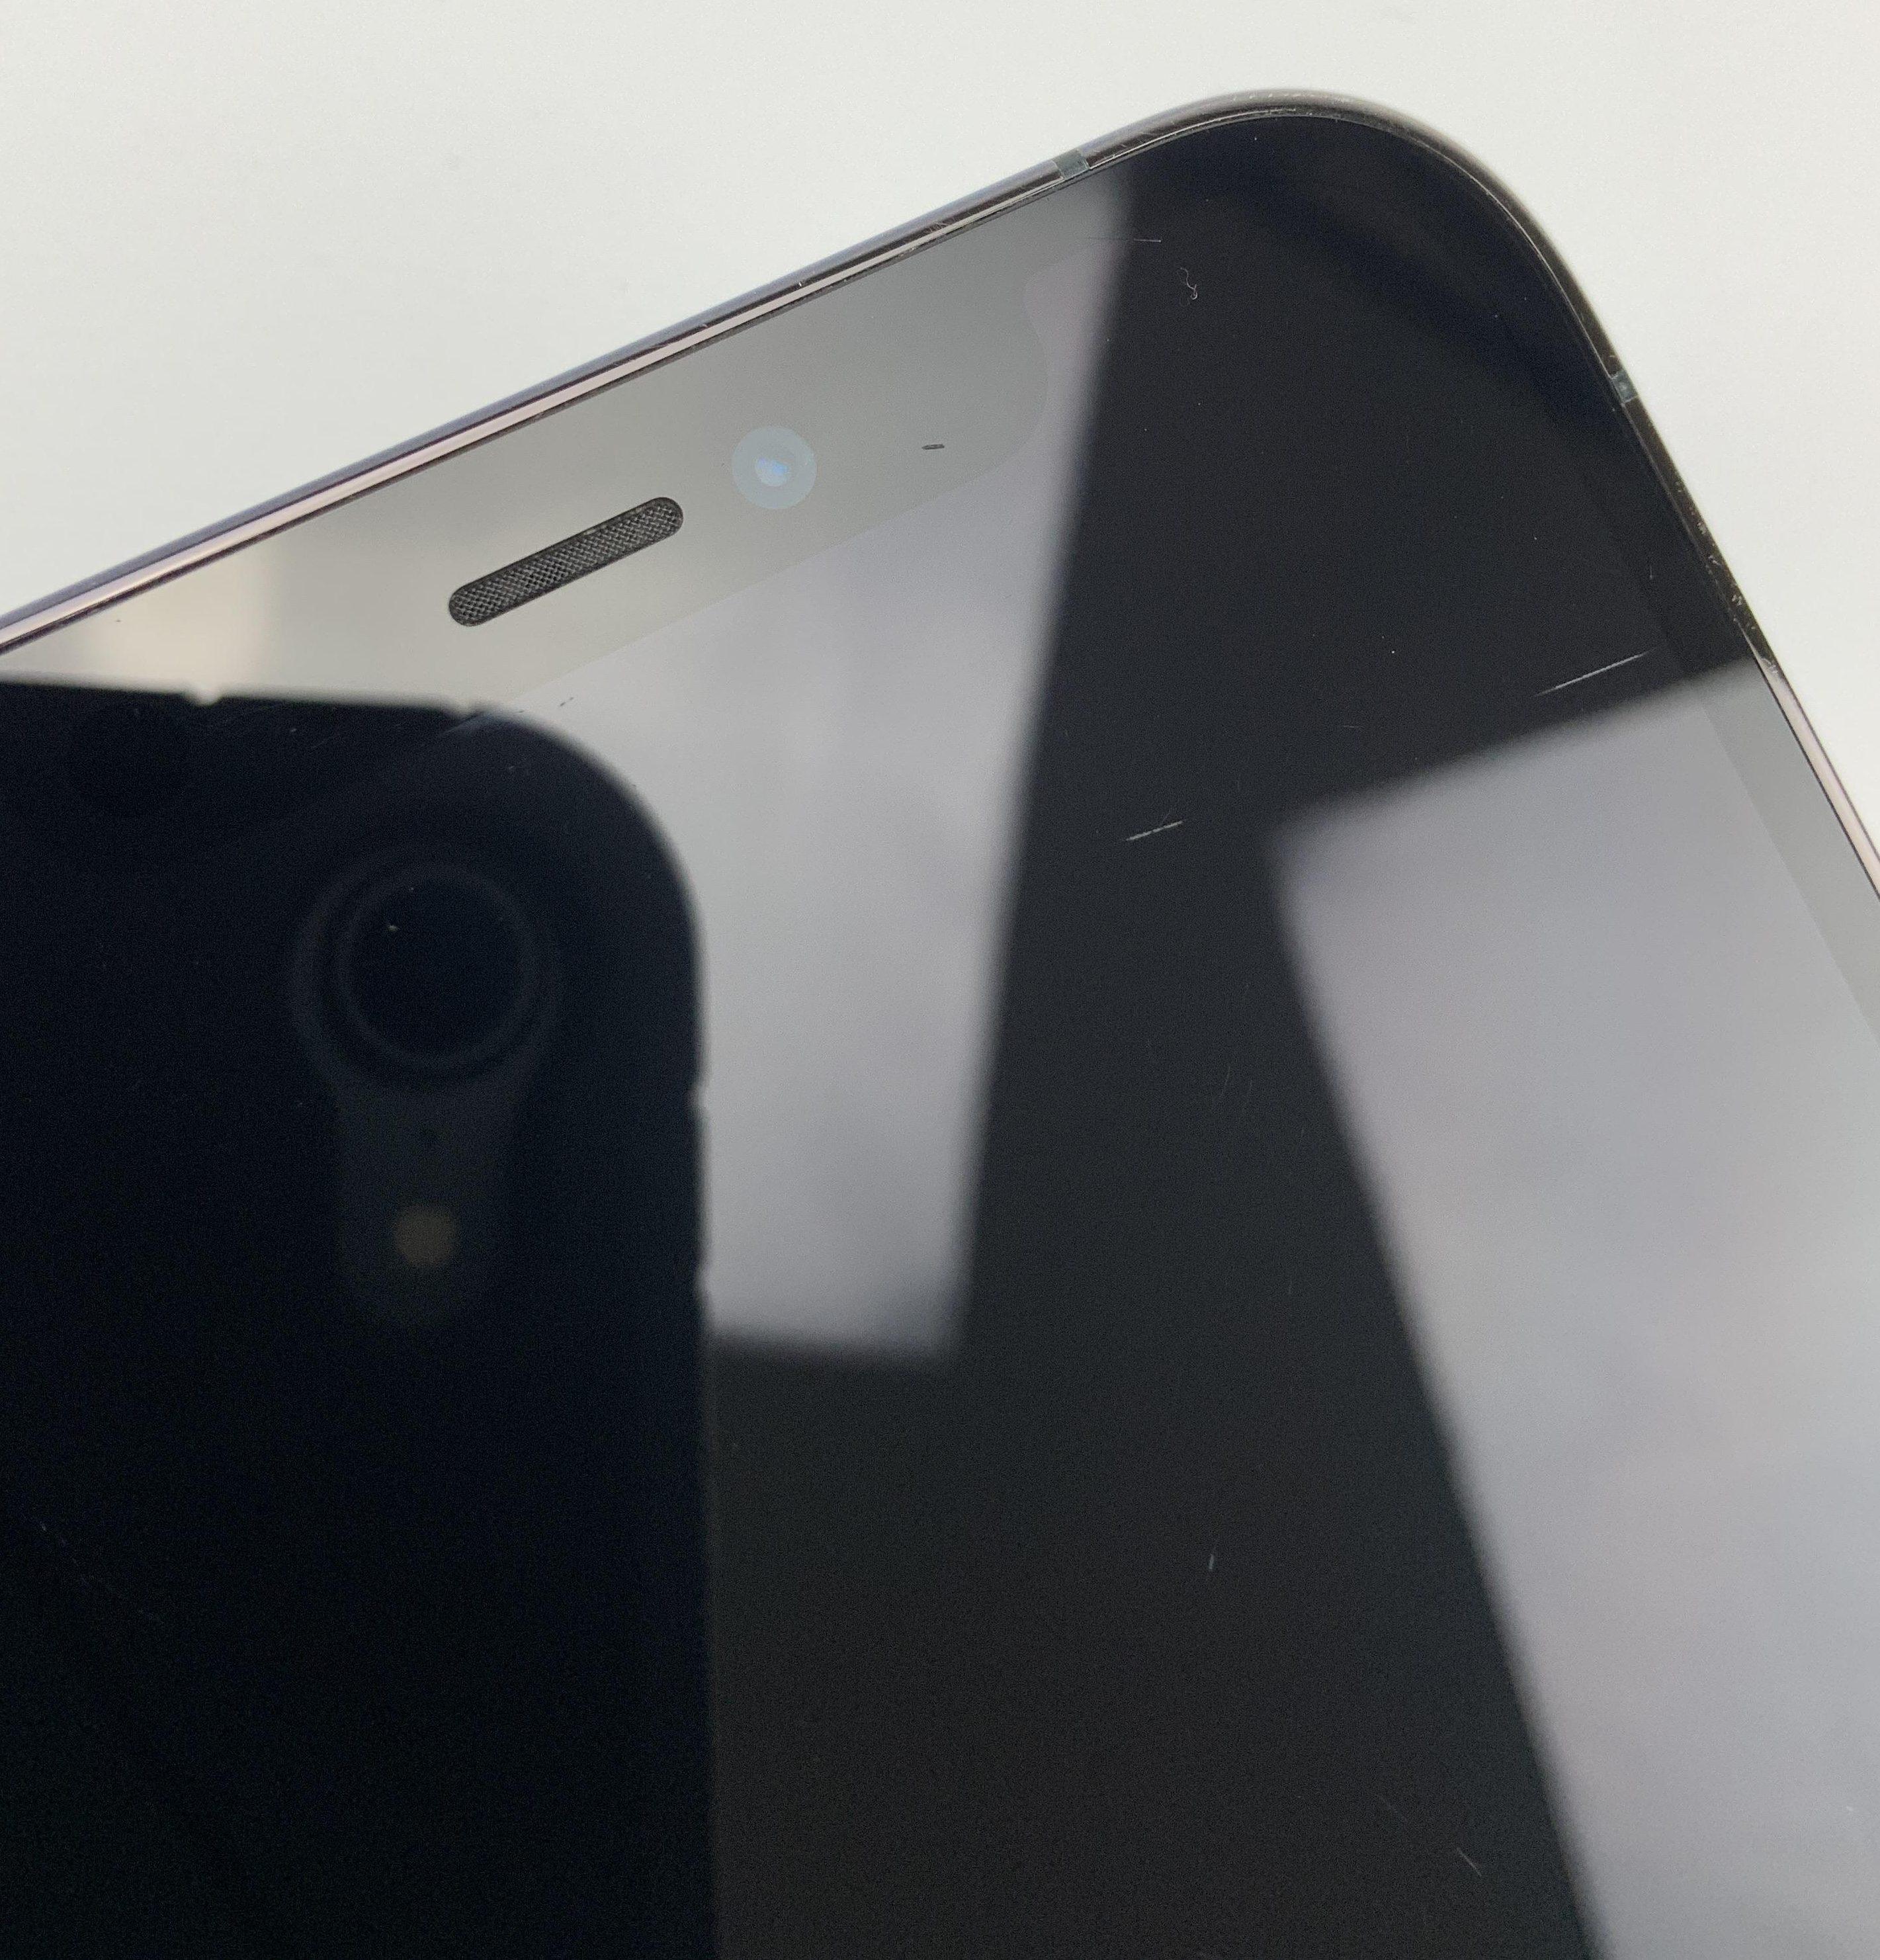 iPhone 12 Pro 128GB, 128GB, Pacific Blue, bild 3